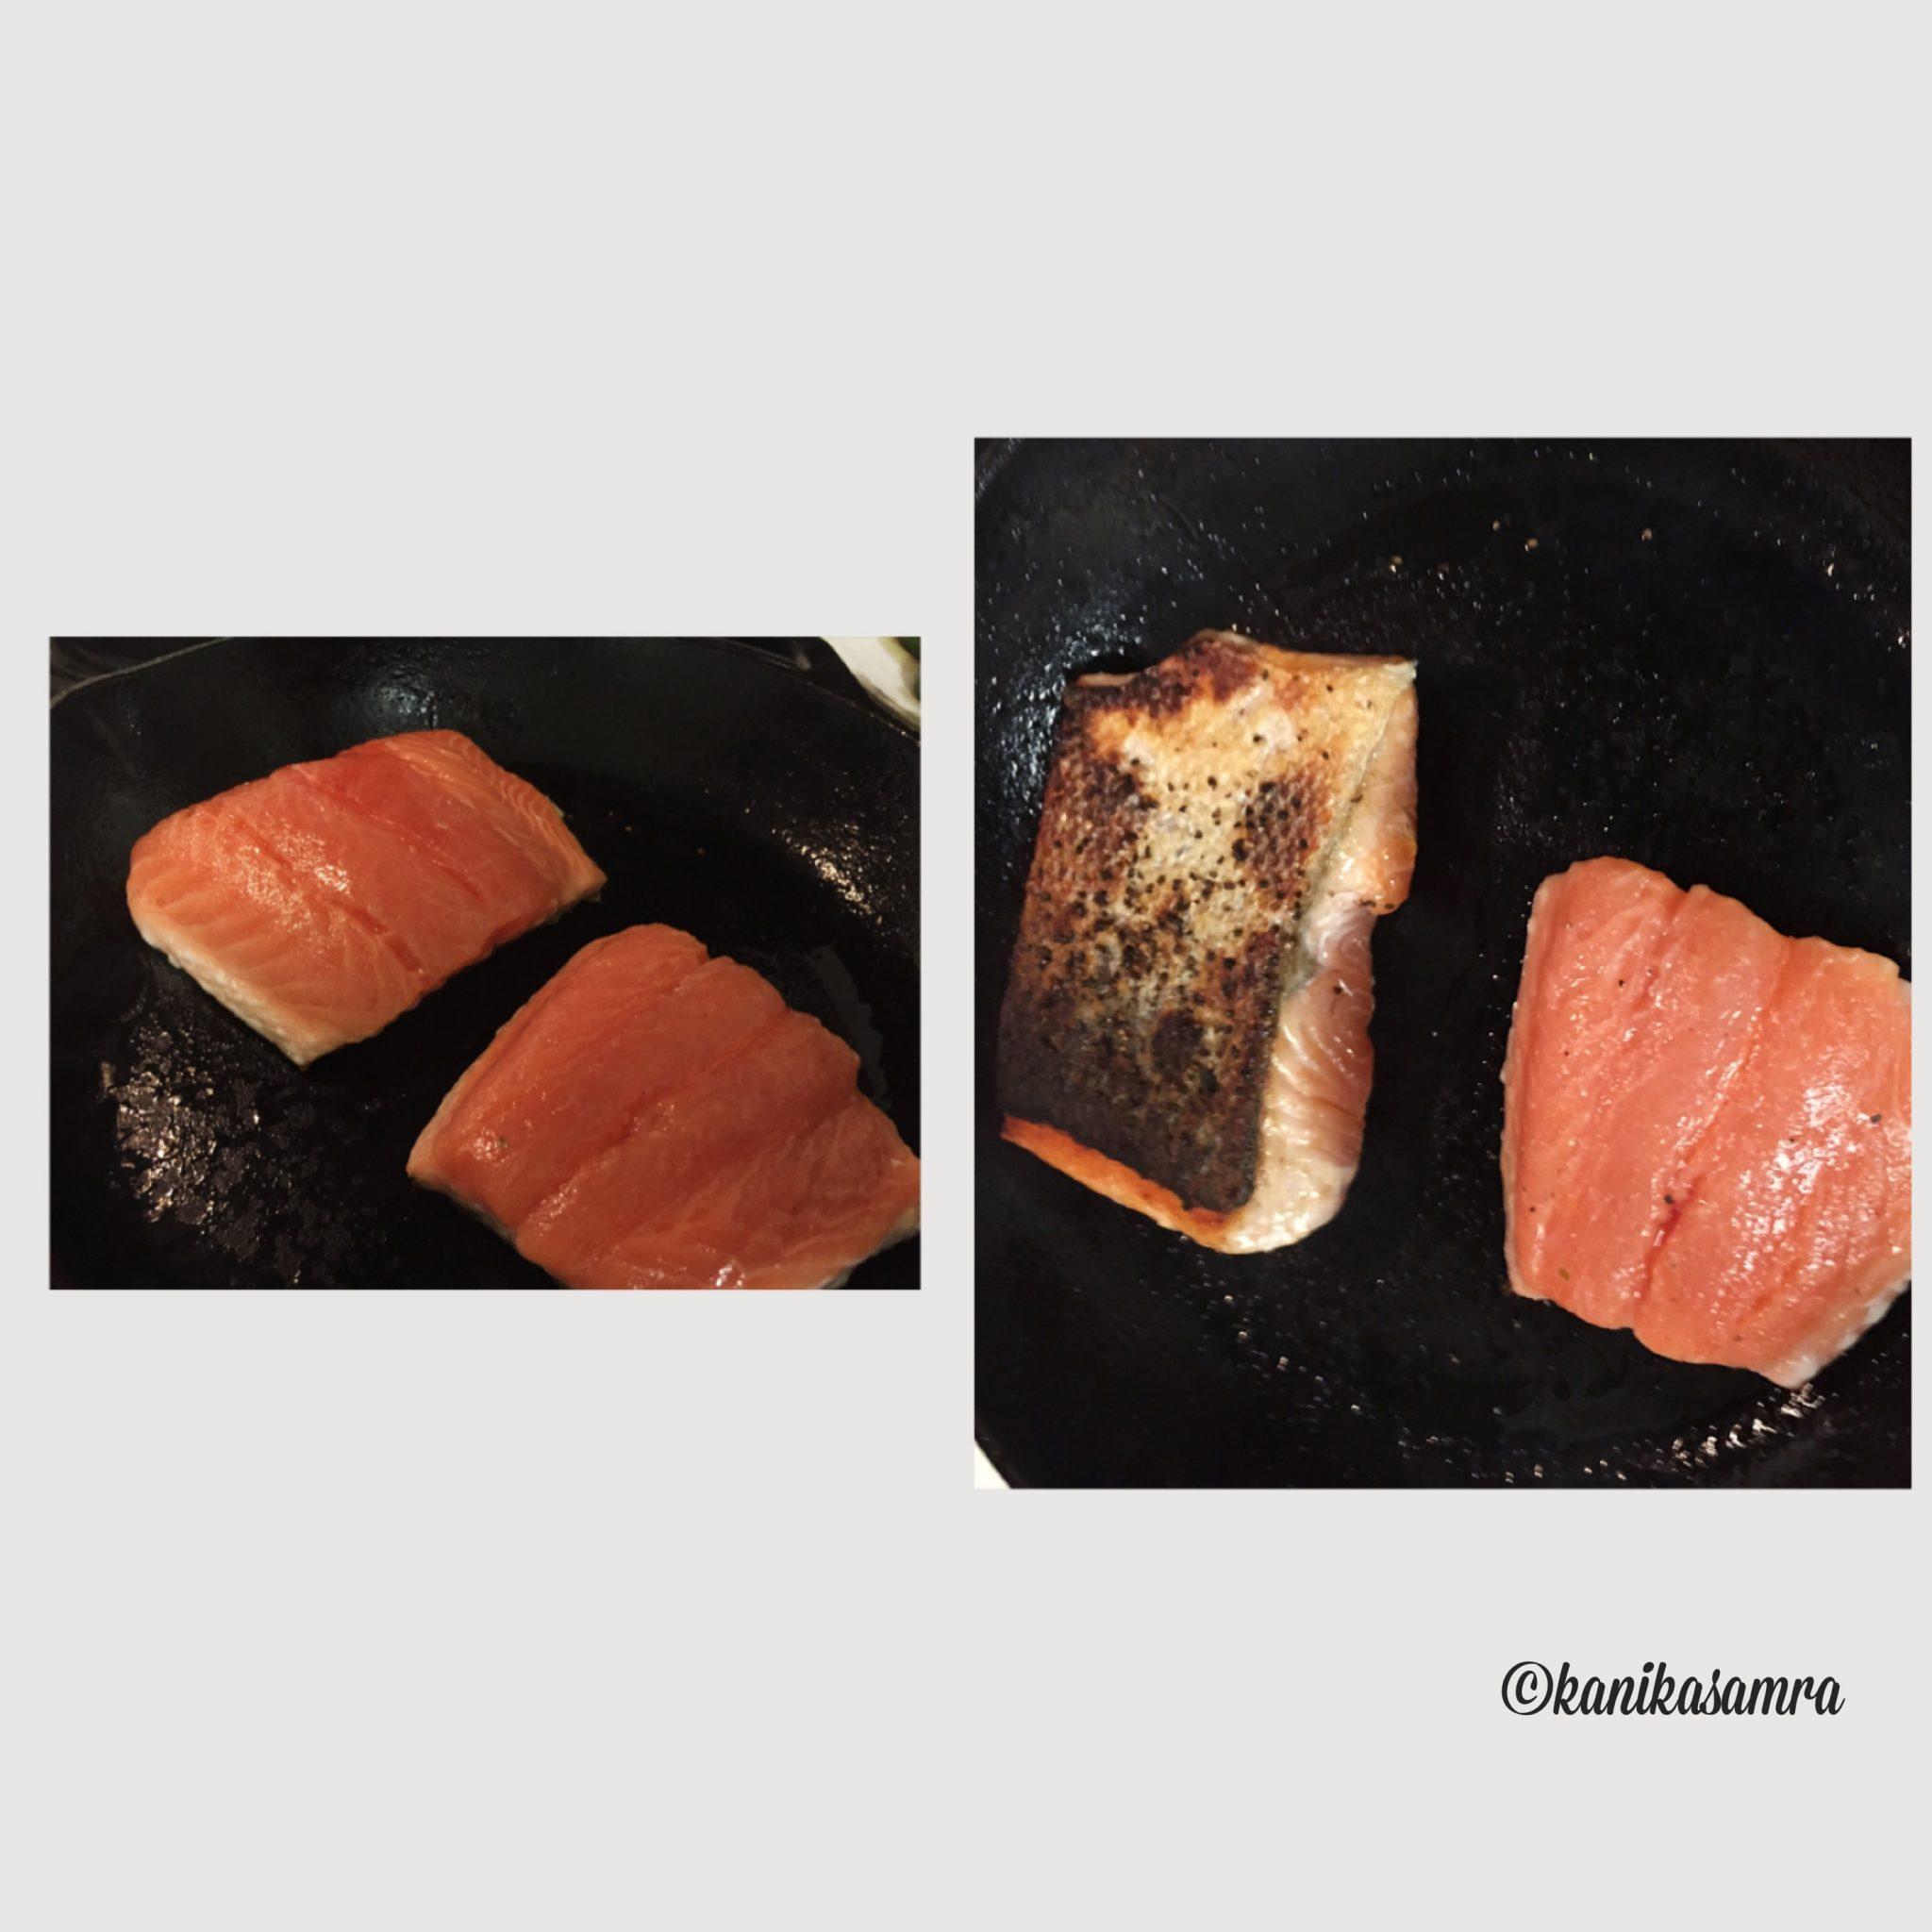 Salmon in the skillet